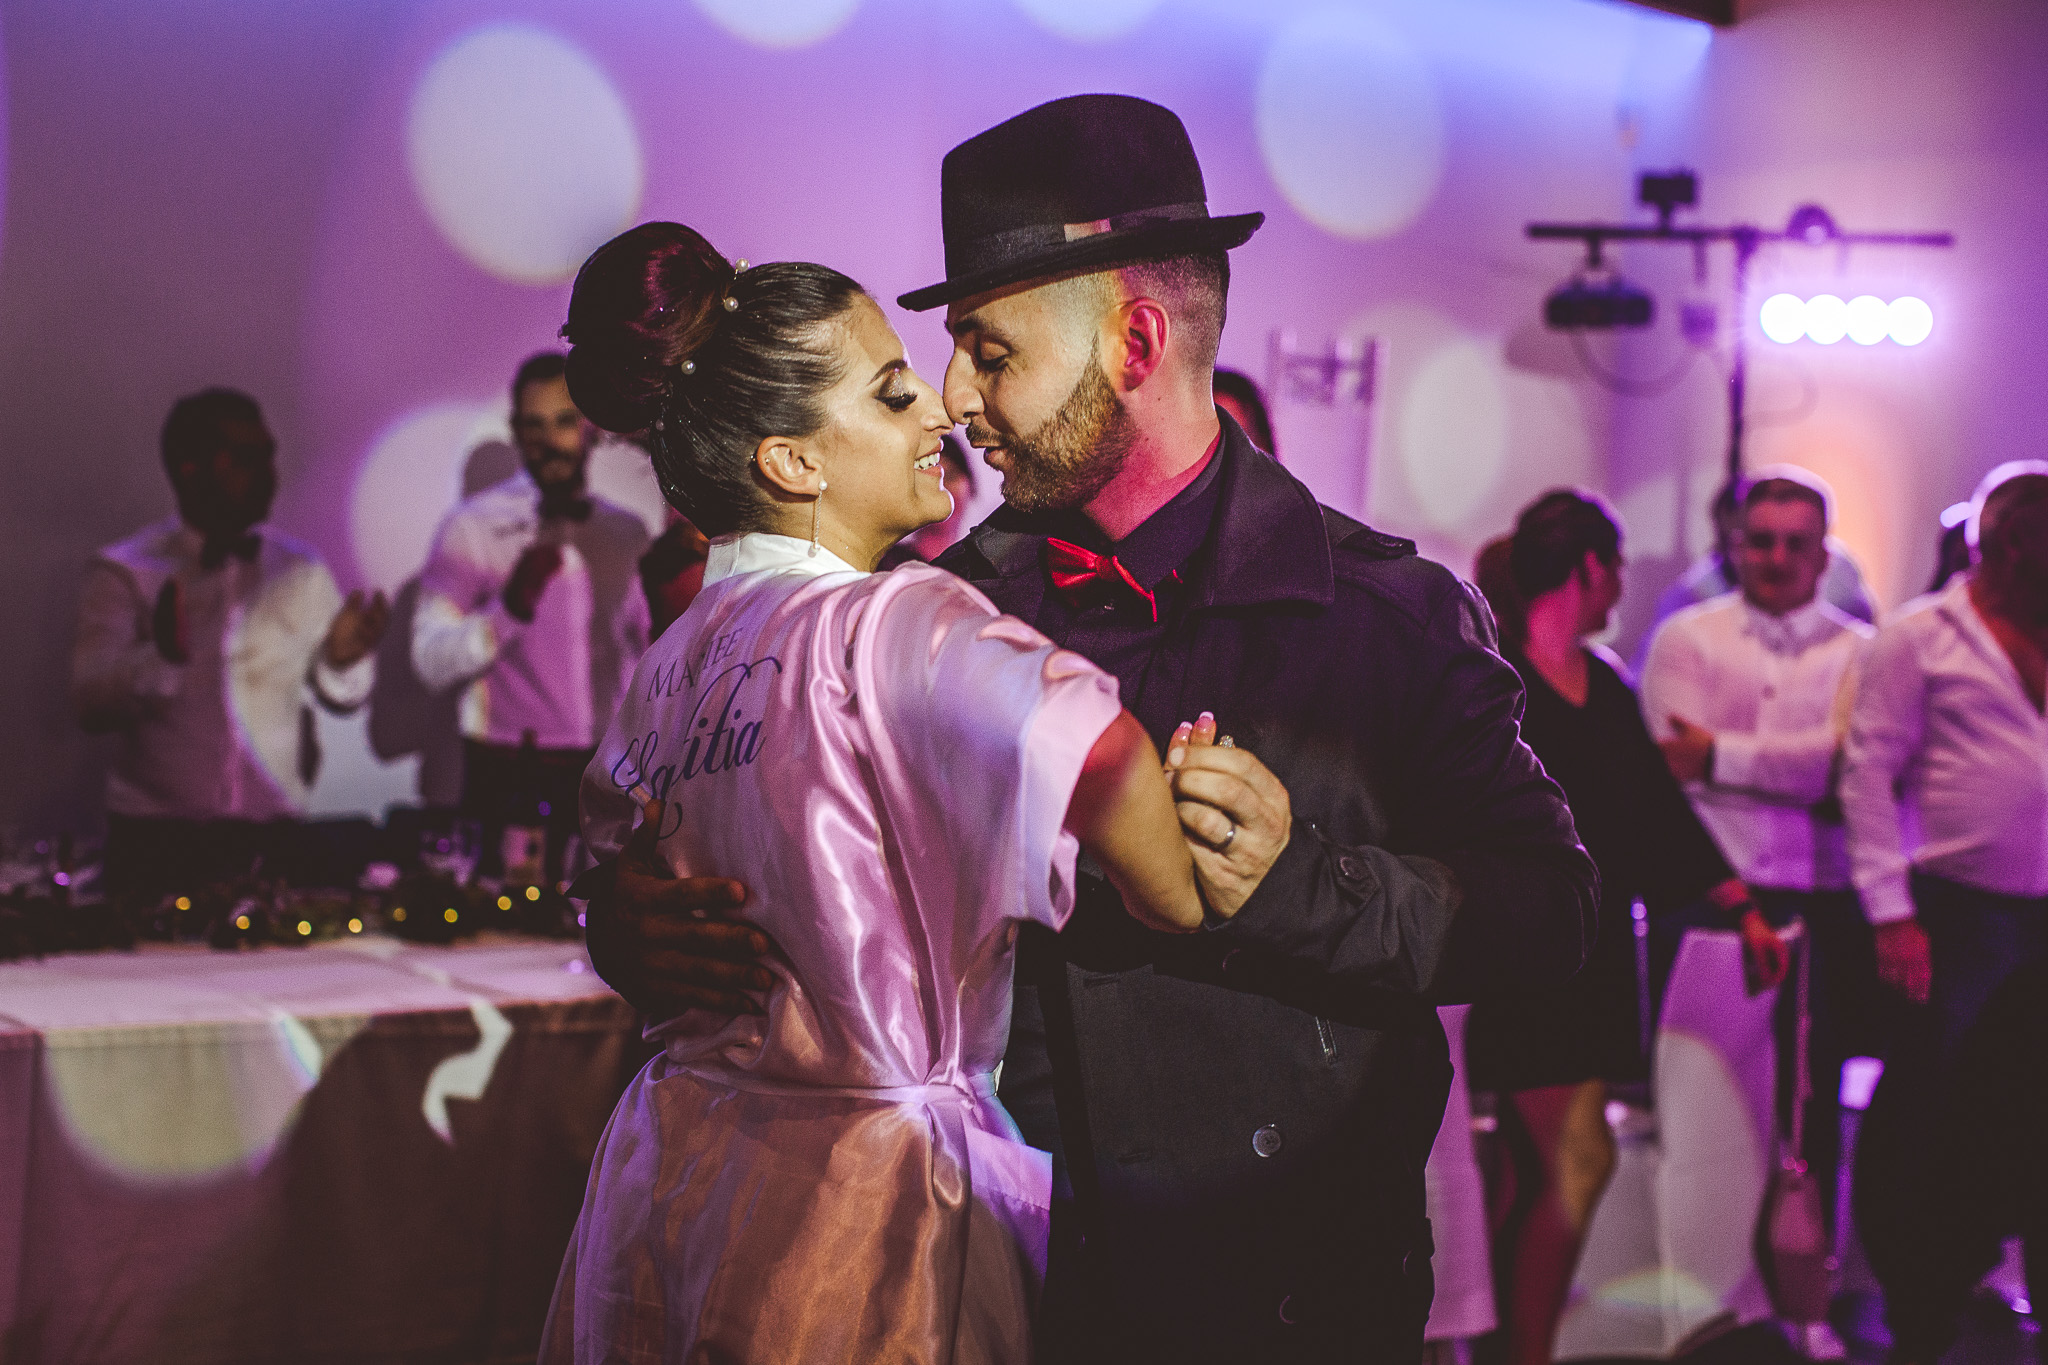 reportage mariage photo soiree premiere danse maries dj muisuqe chateau mons gers